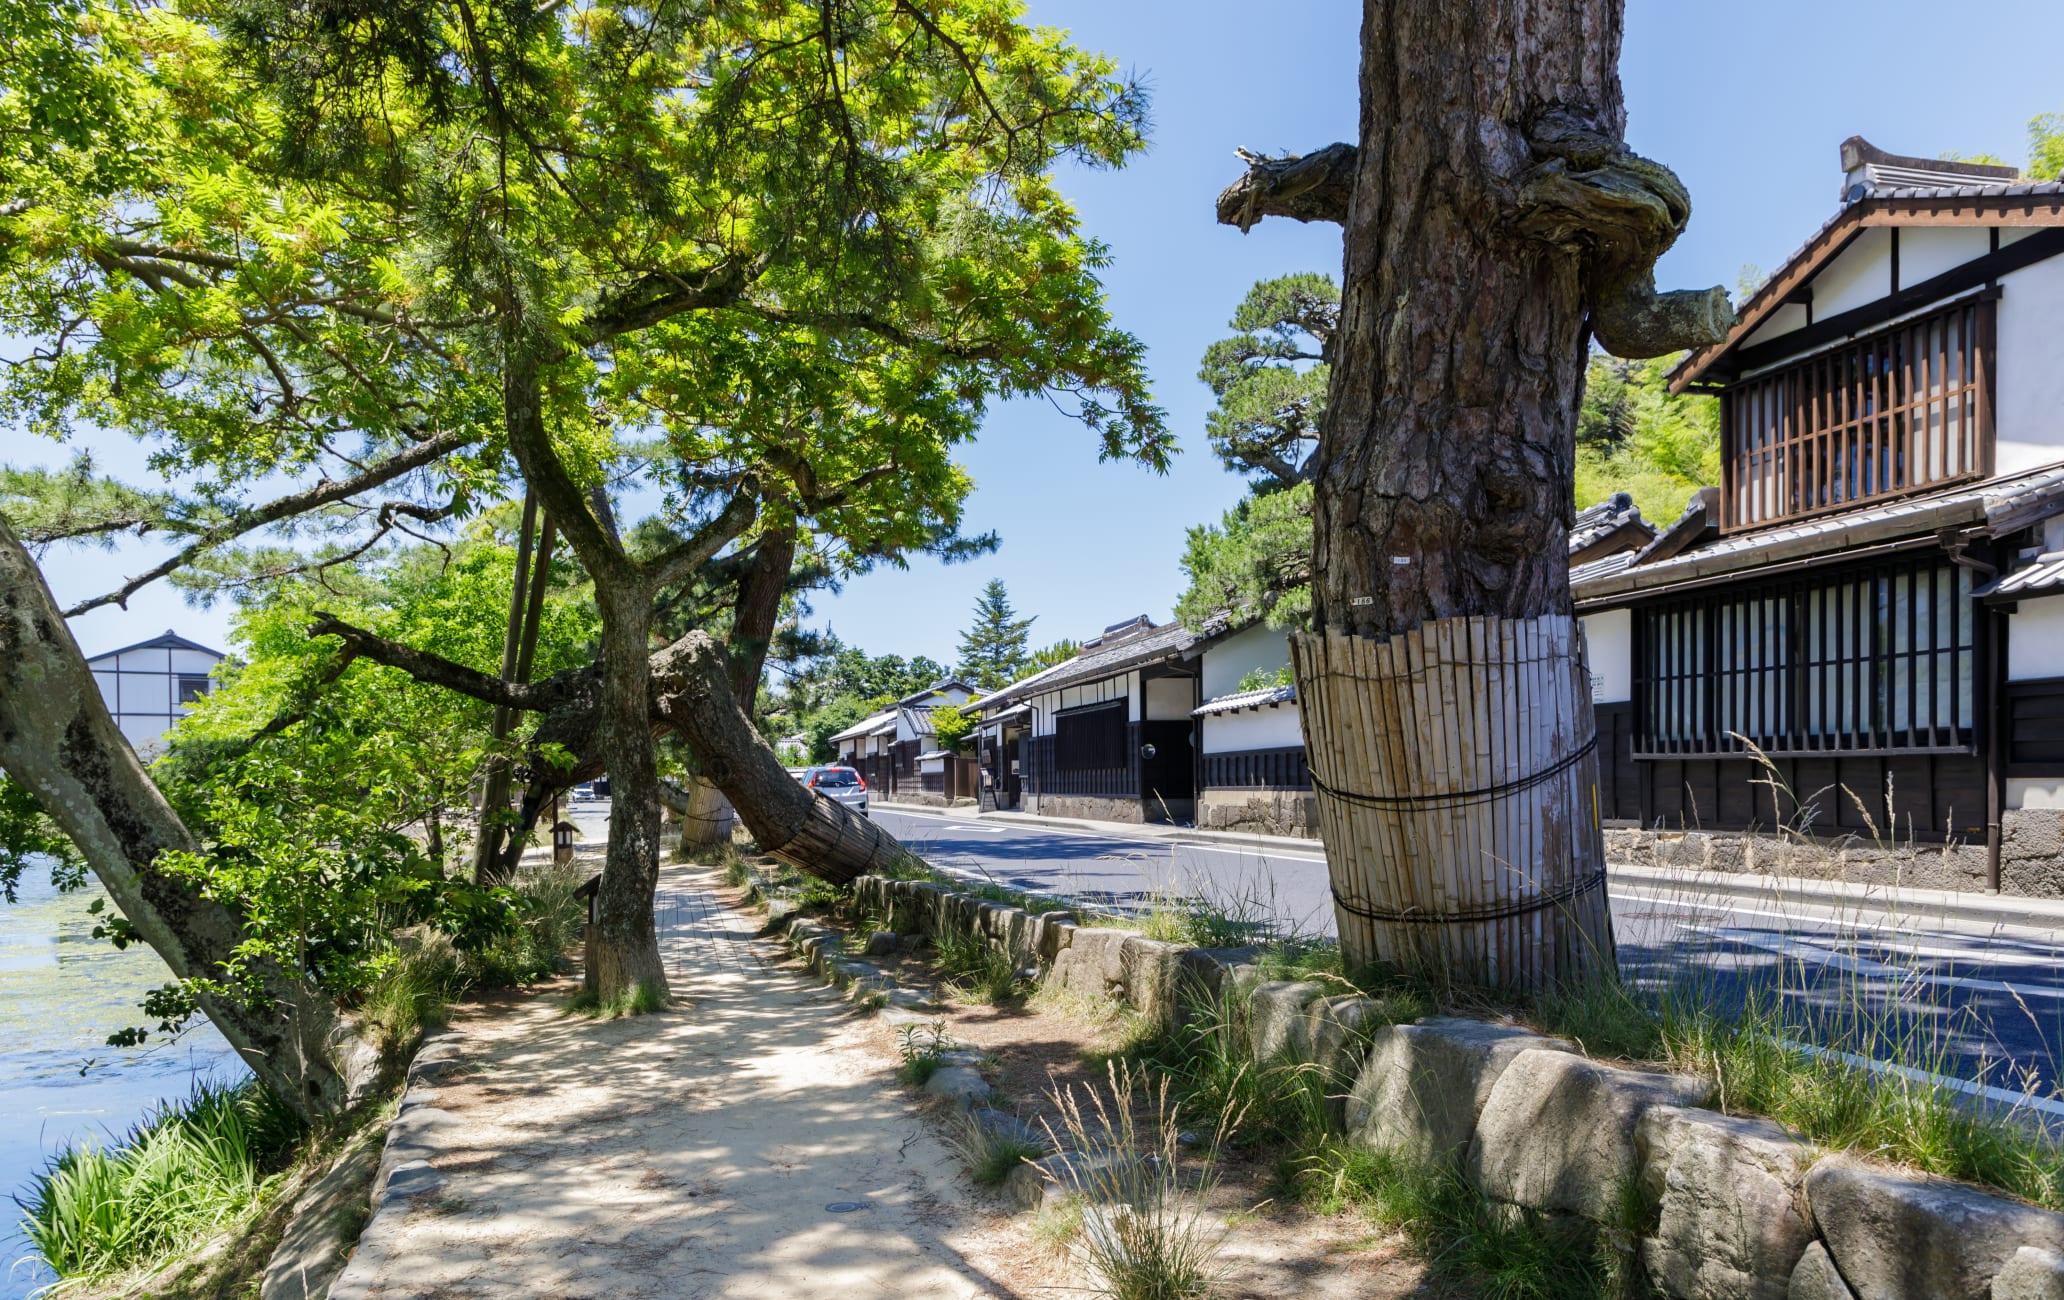 Shiomi-nawate Street